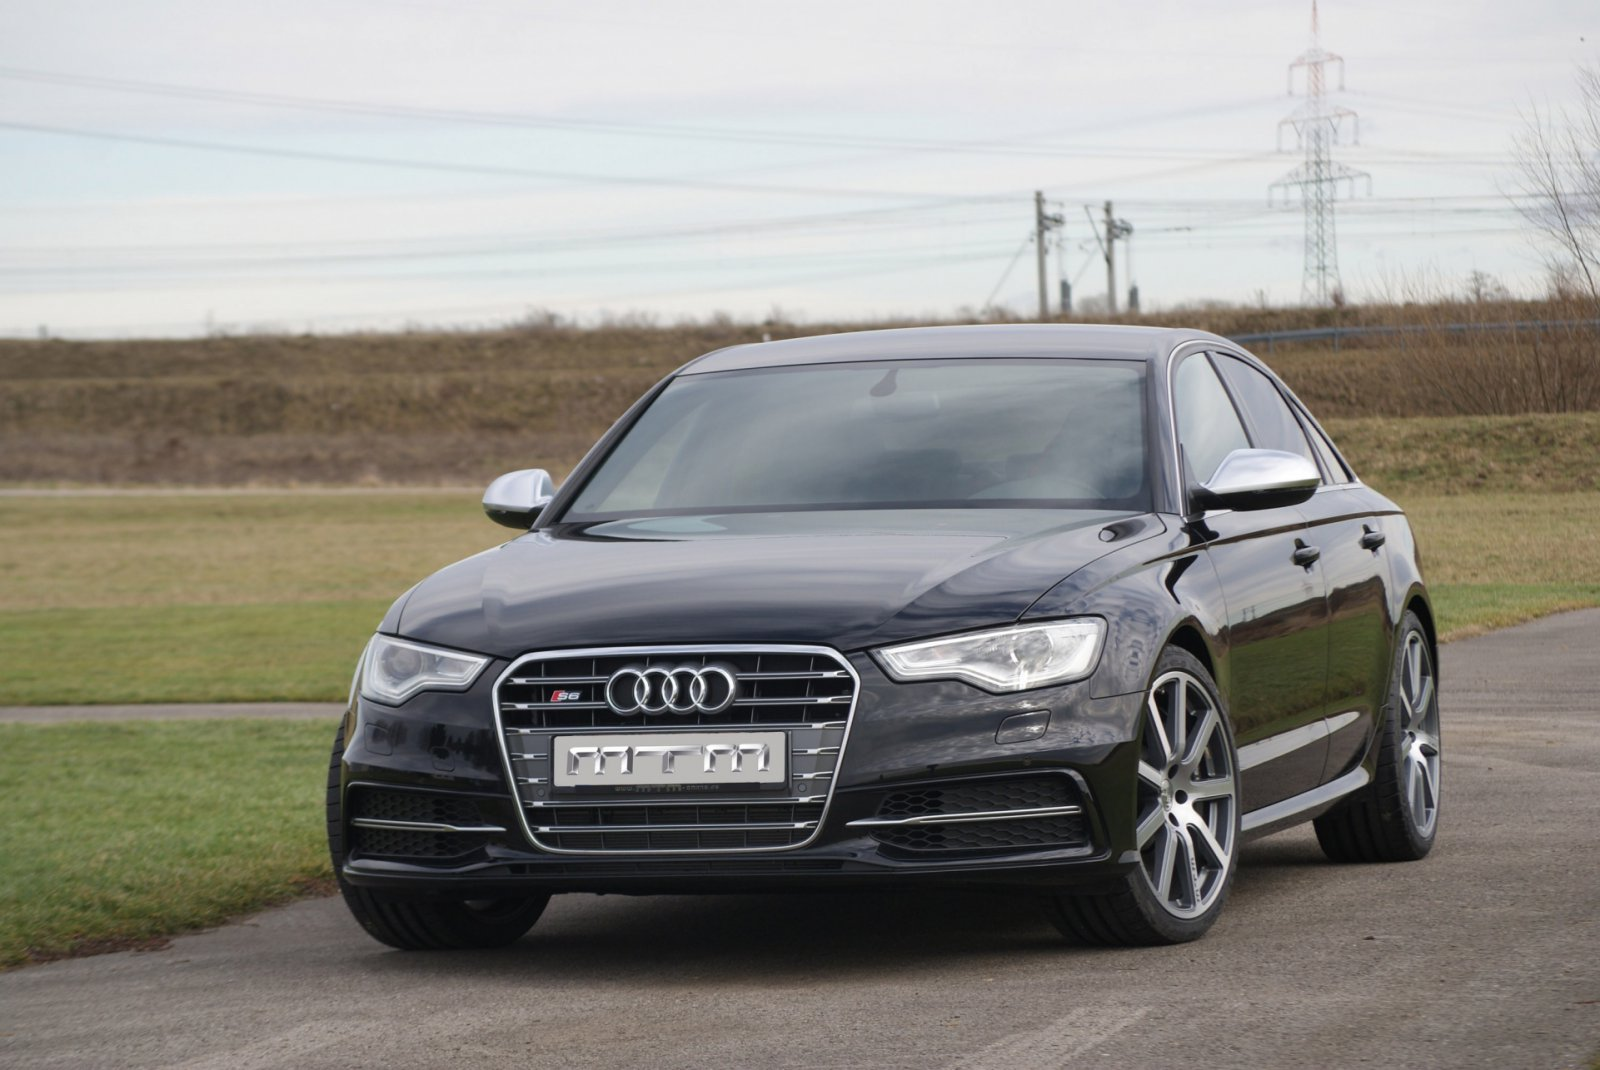 Audi-S6-C7-10